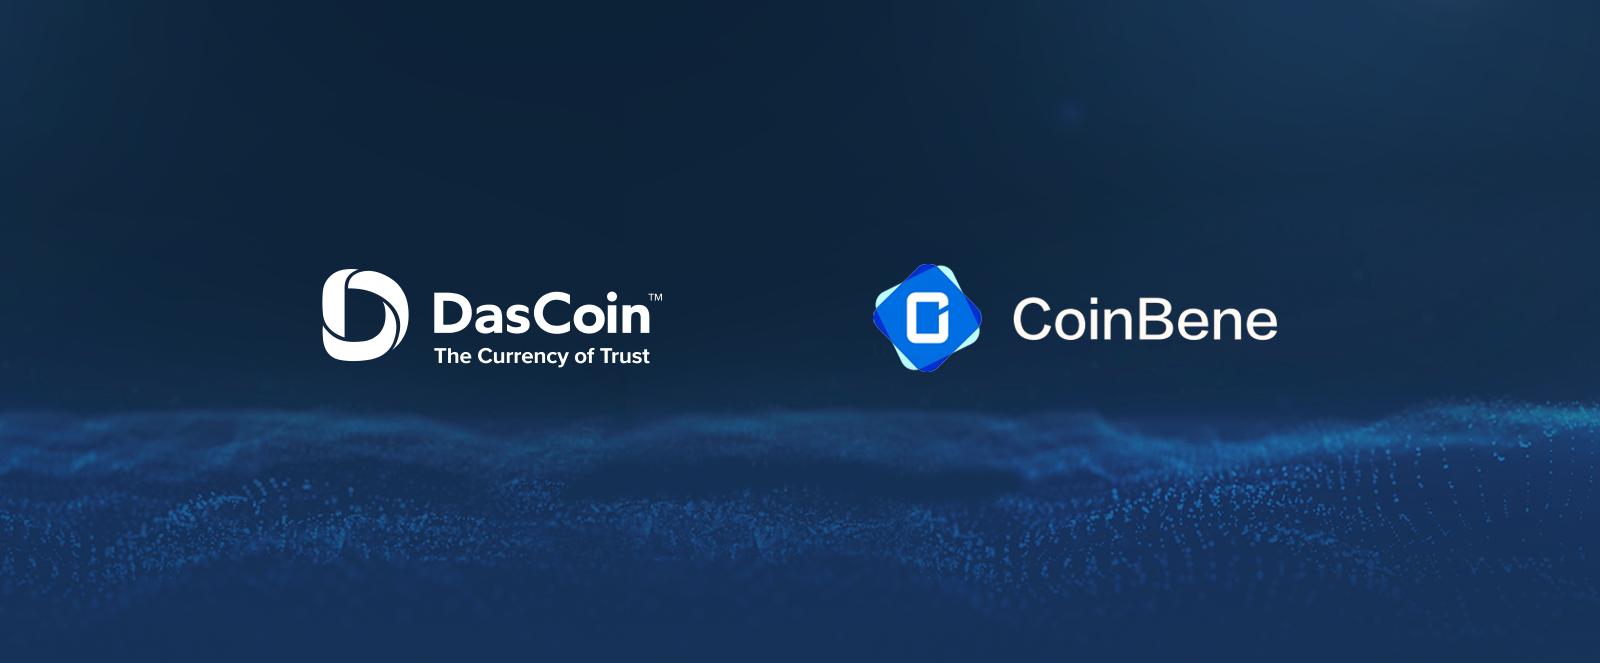 DasCoin już wkrótce na CoinBene